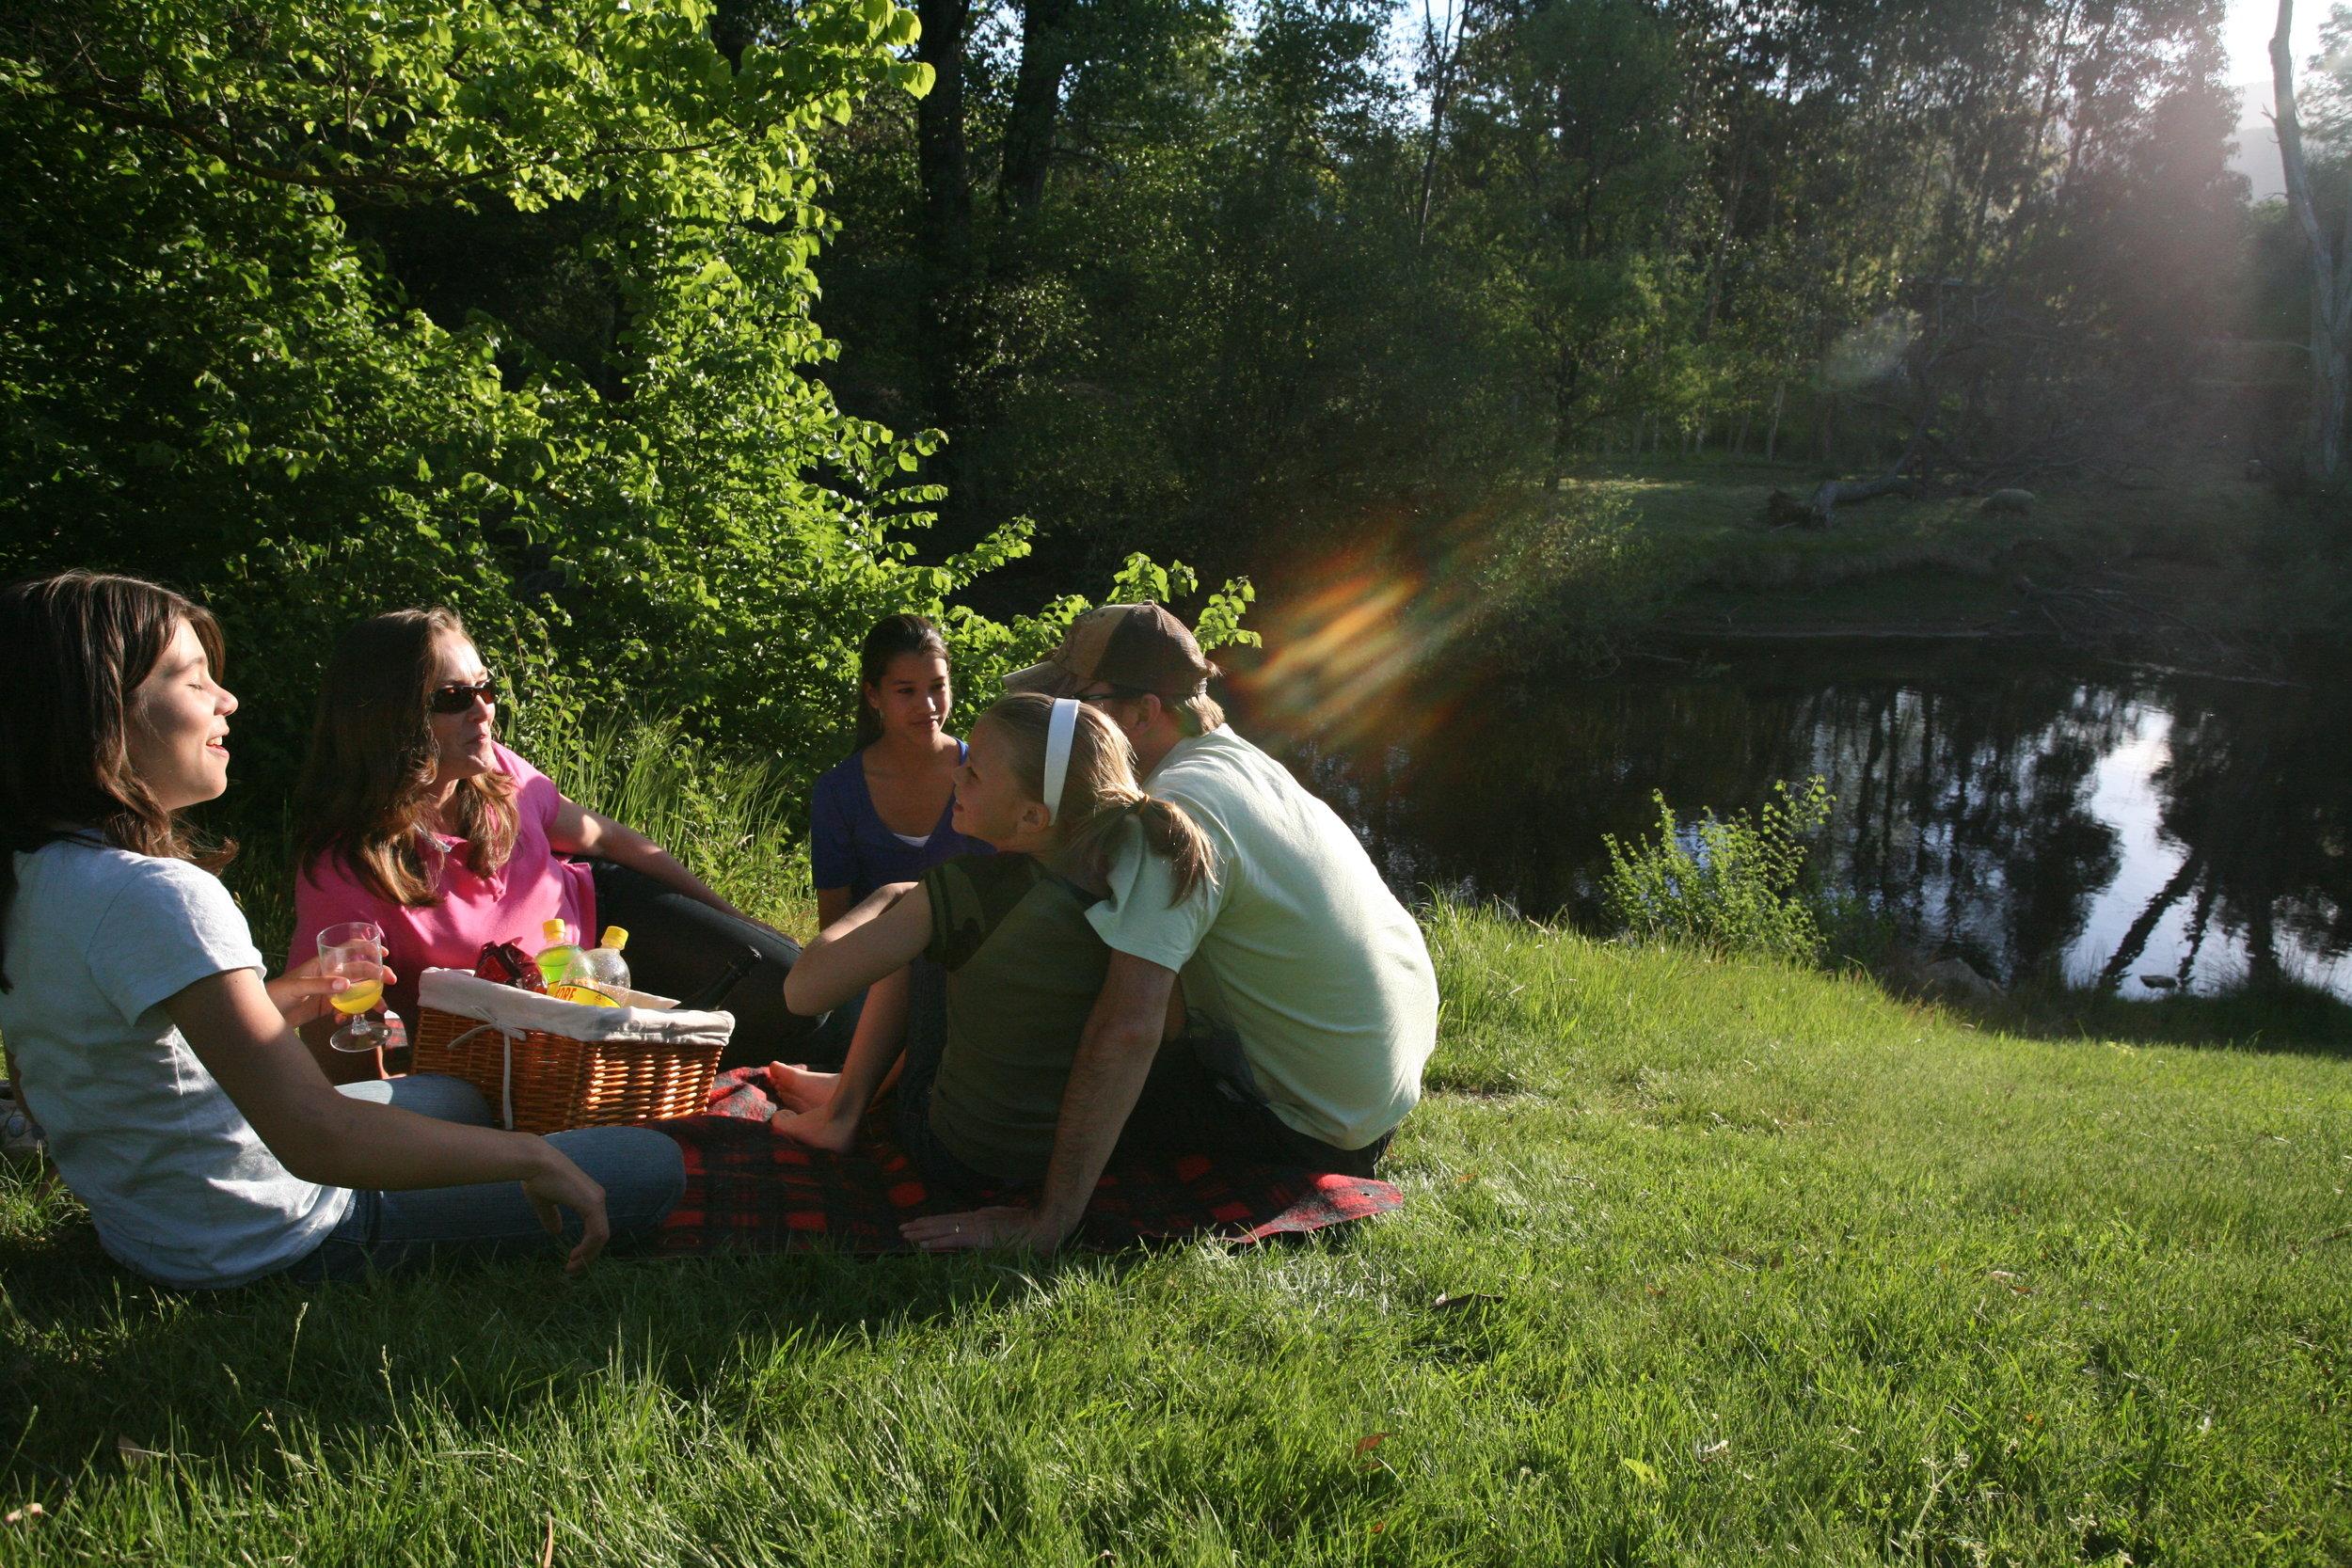 Picnics along the Ovens River